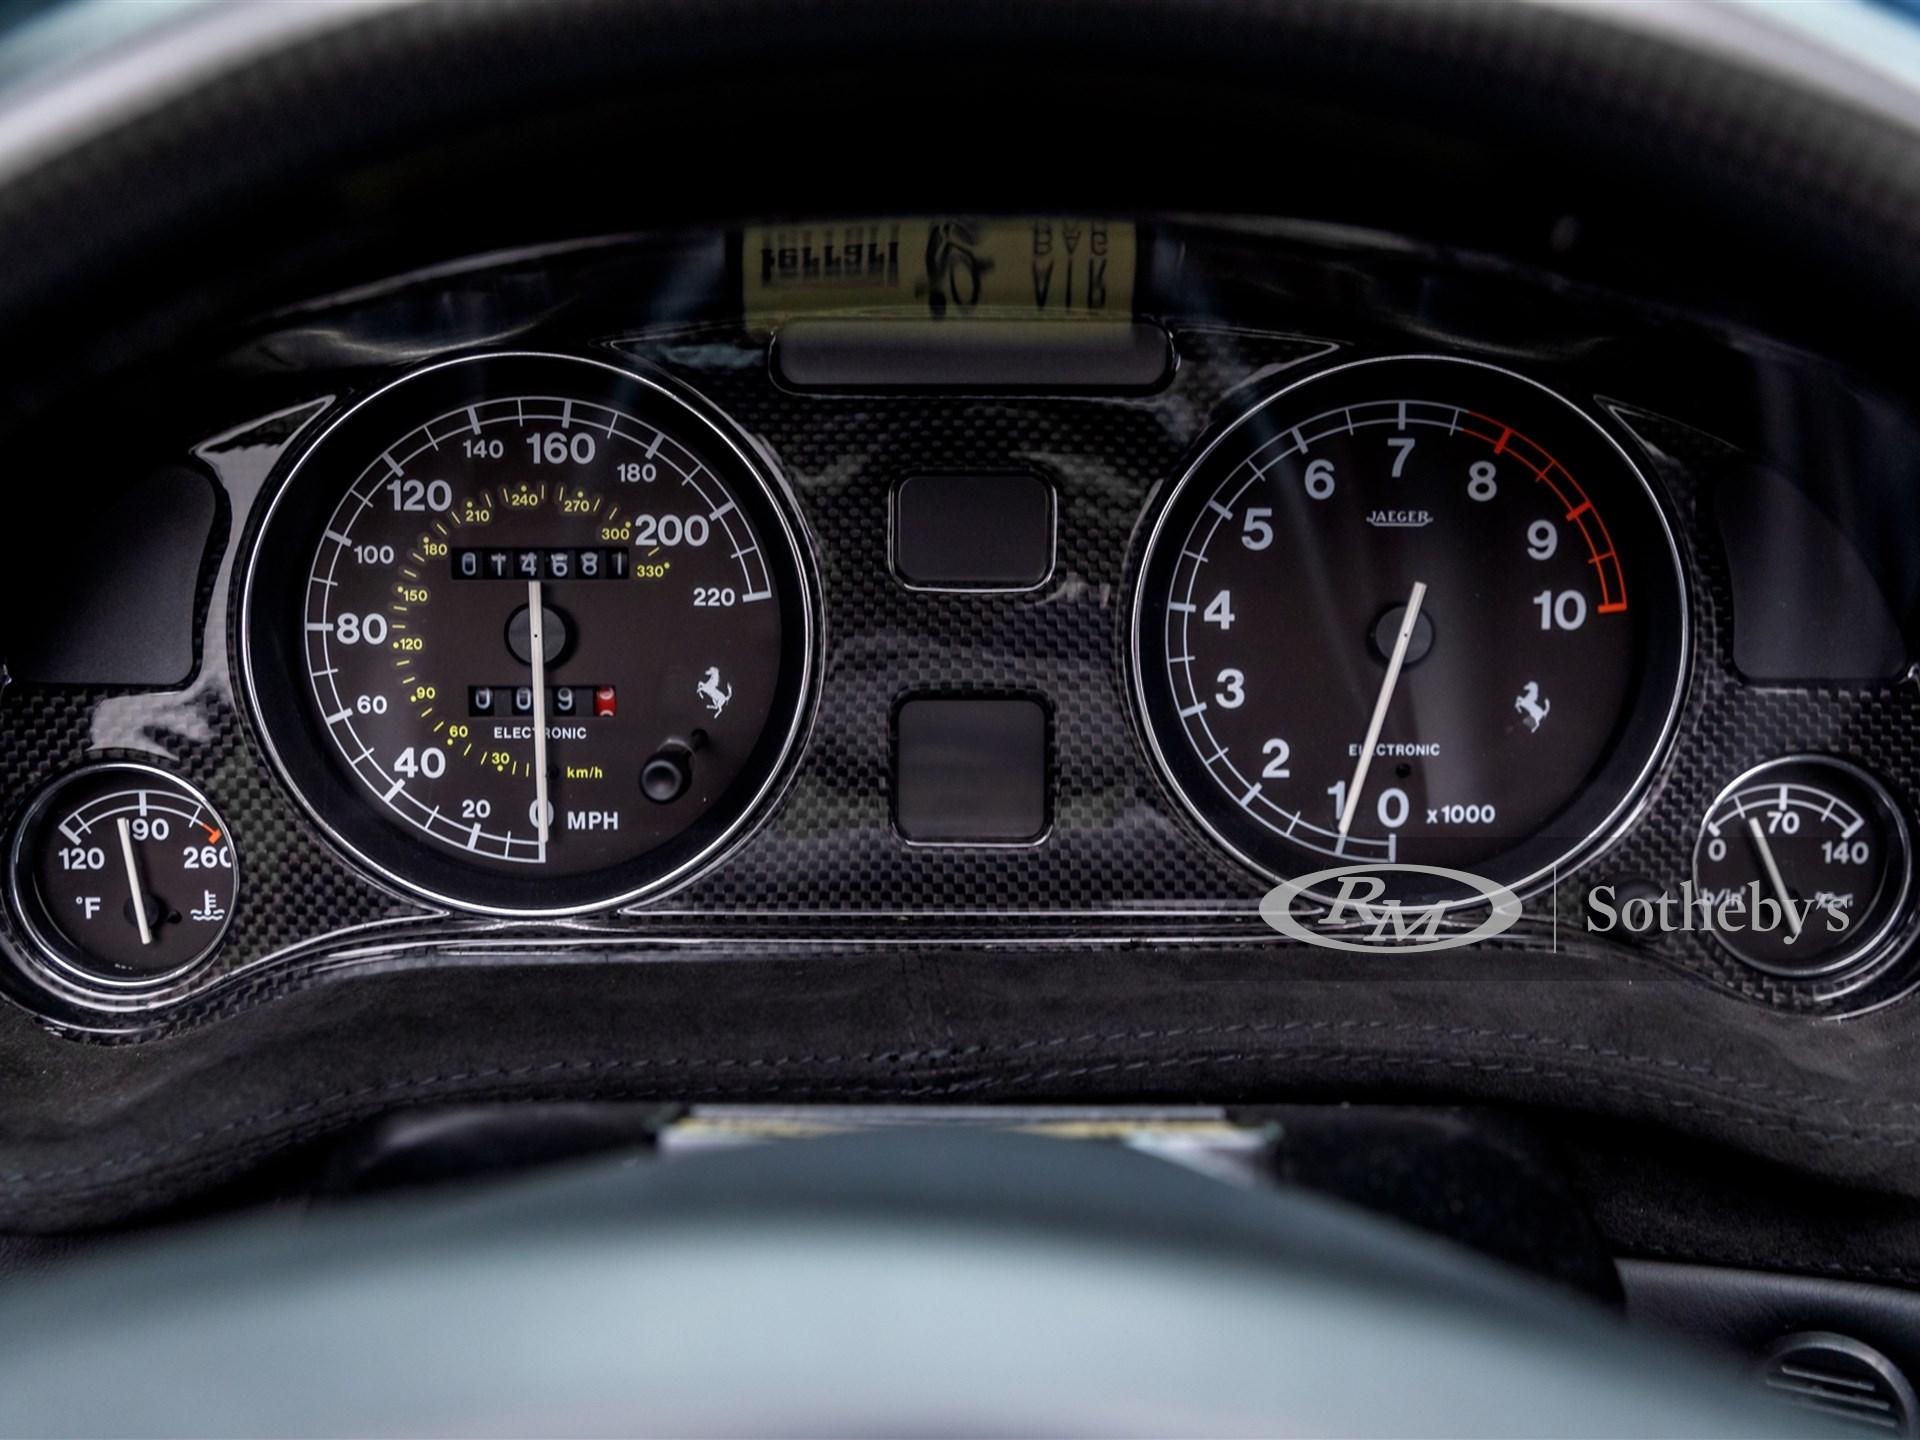 2001 Ferrari 550 Barchetta Pininfarina -